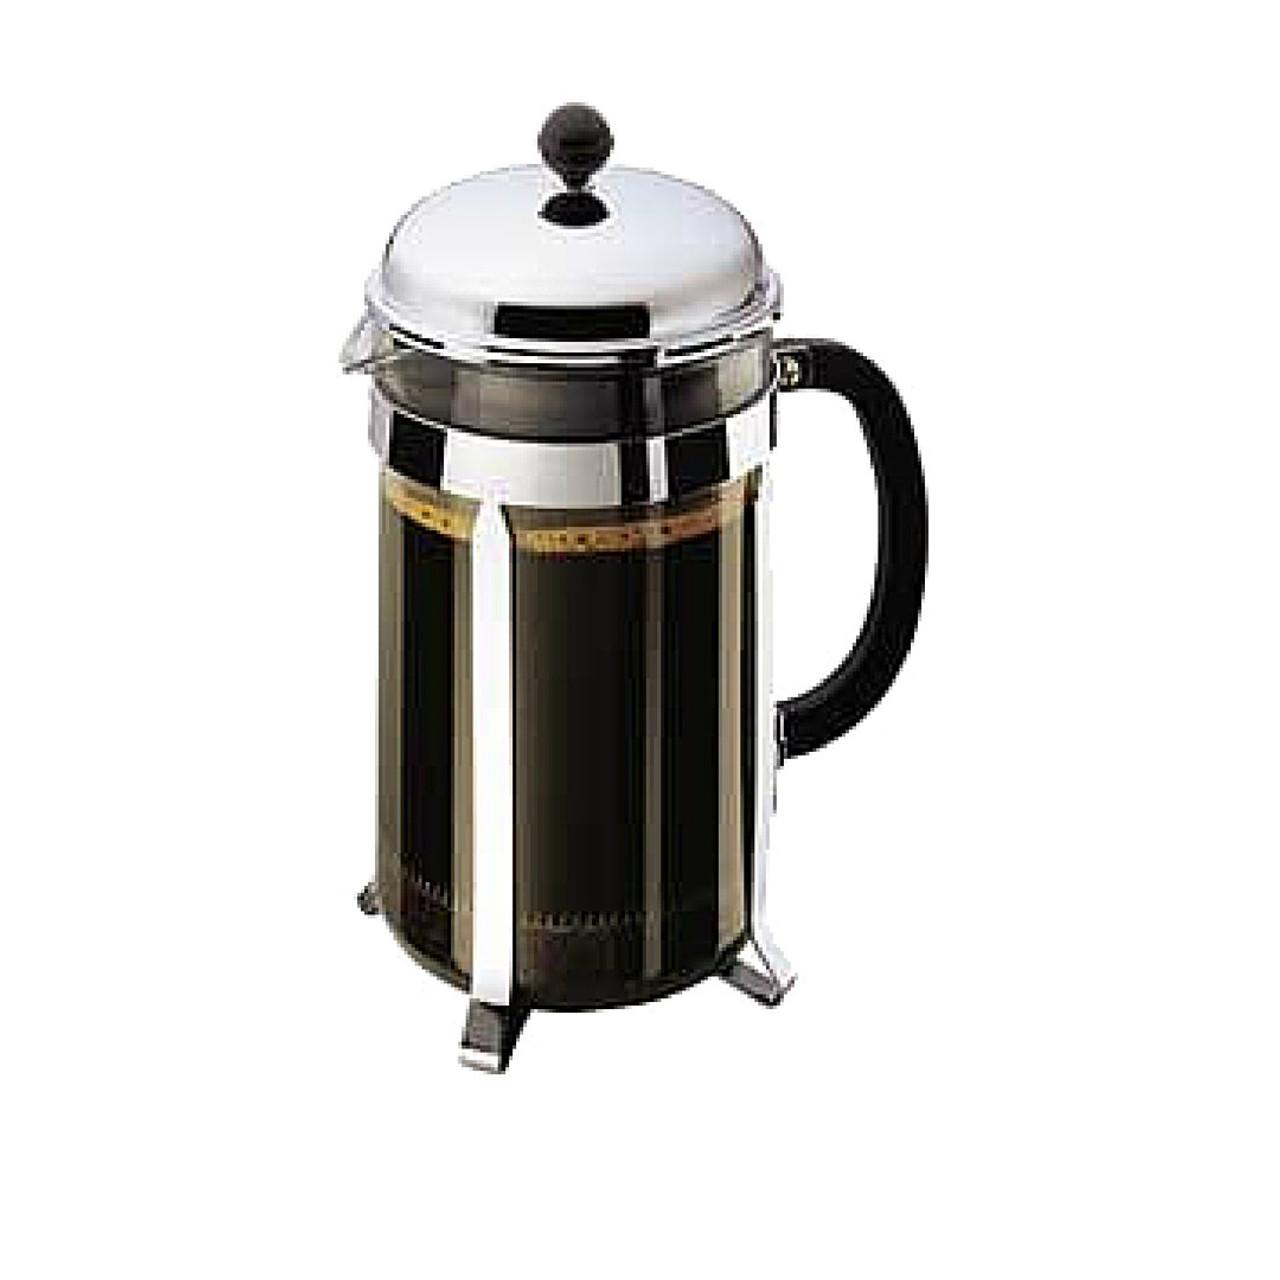 Bodum Chambord French Press, 12 Cup